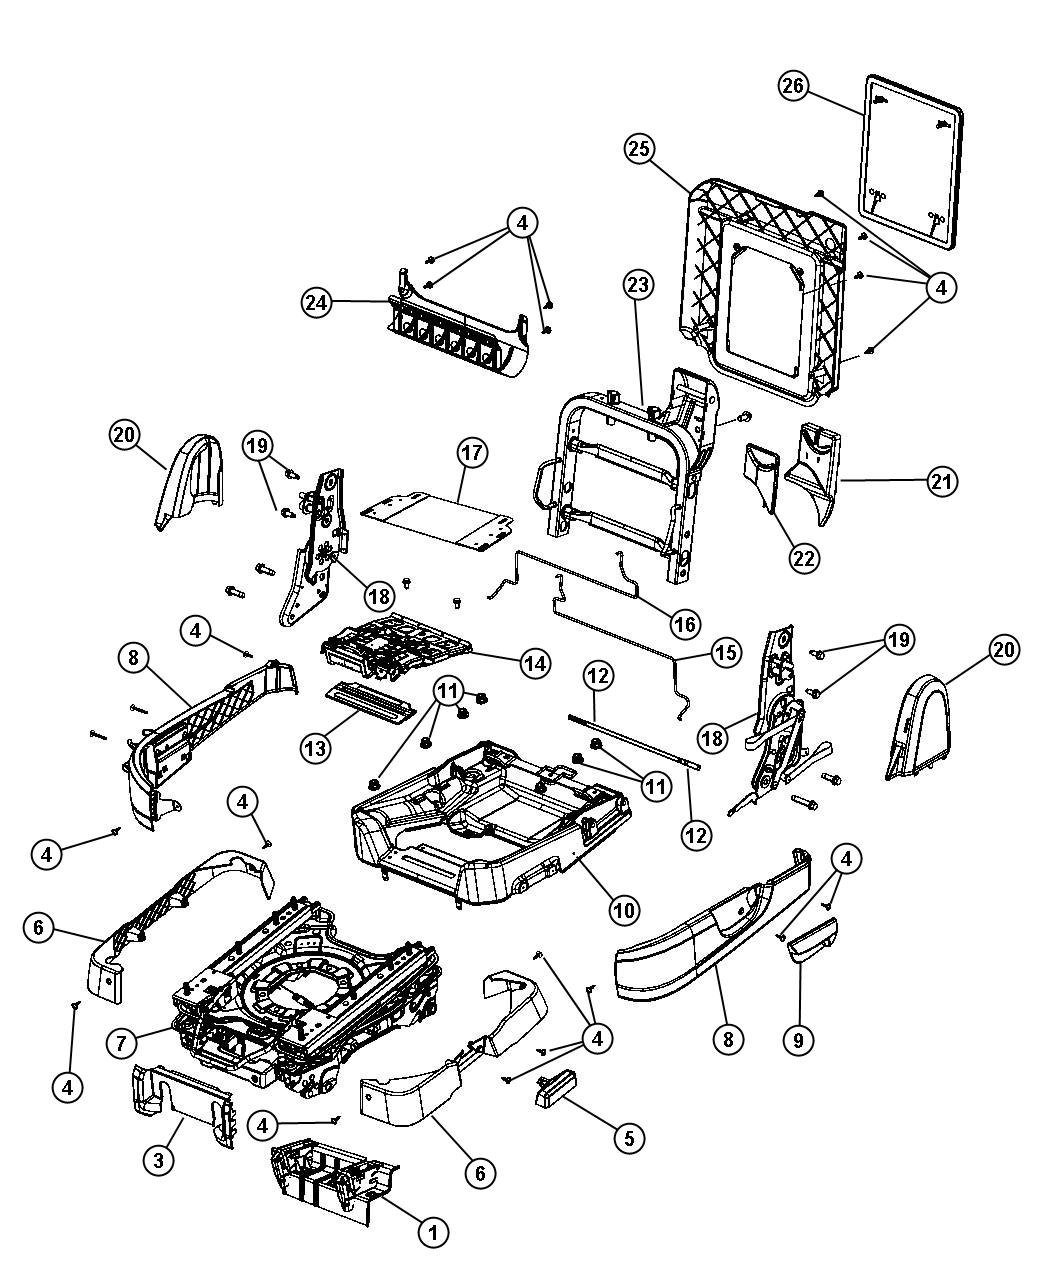 2008 Dodge Grand Caravan Swivel mechanism. Right. Second